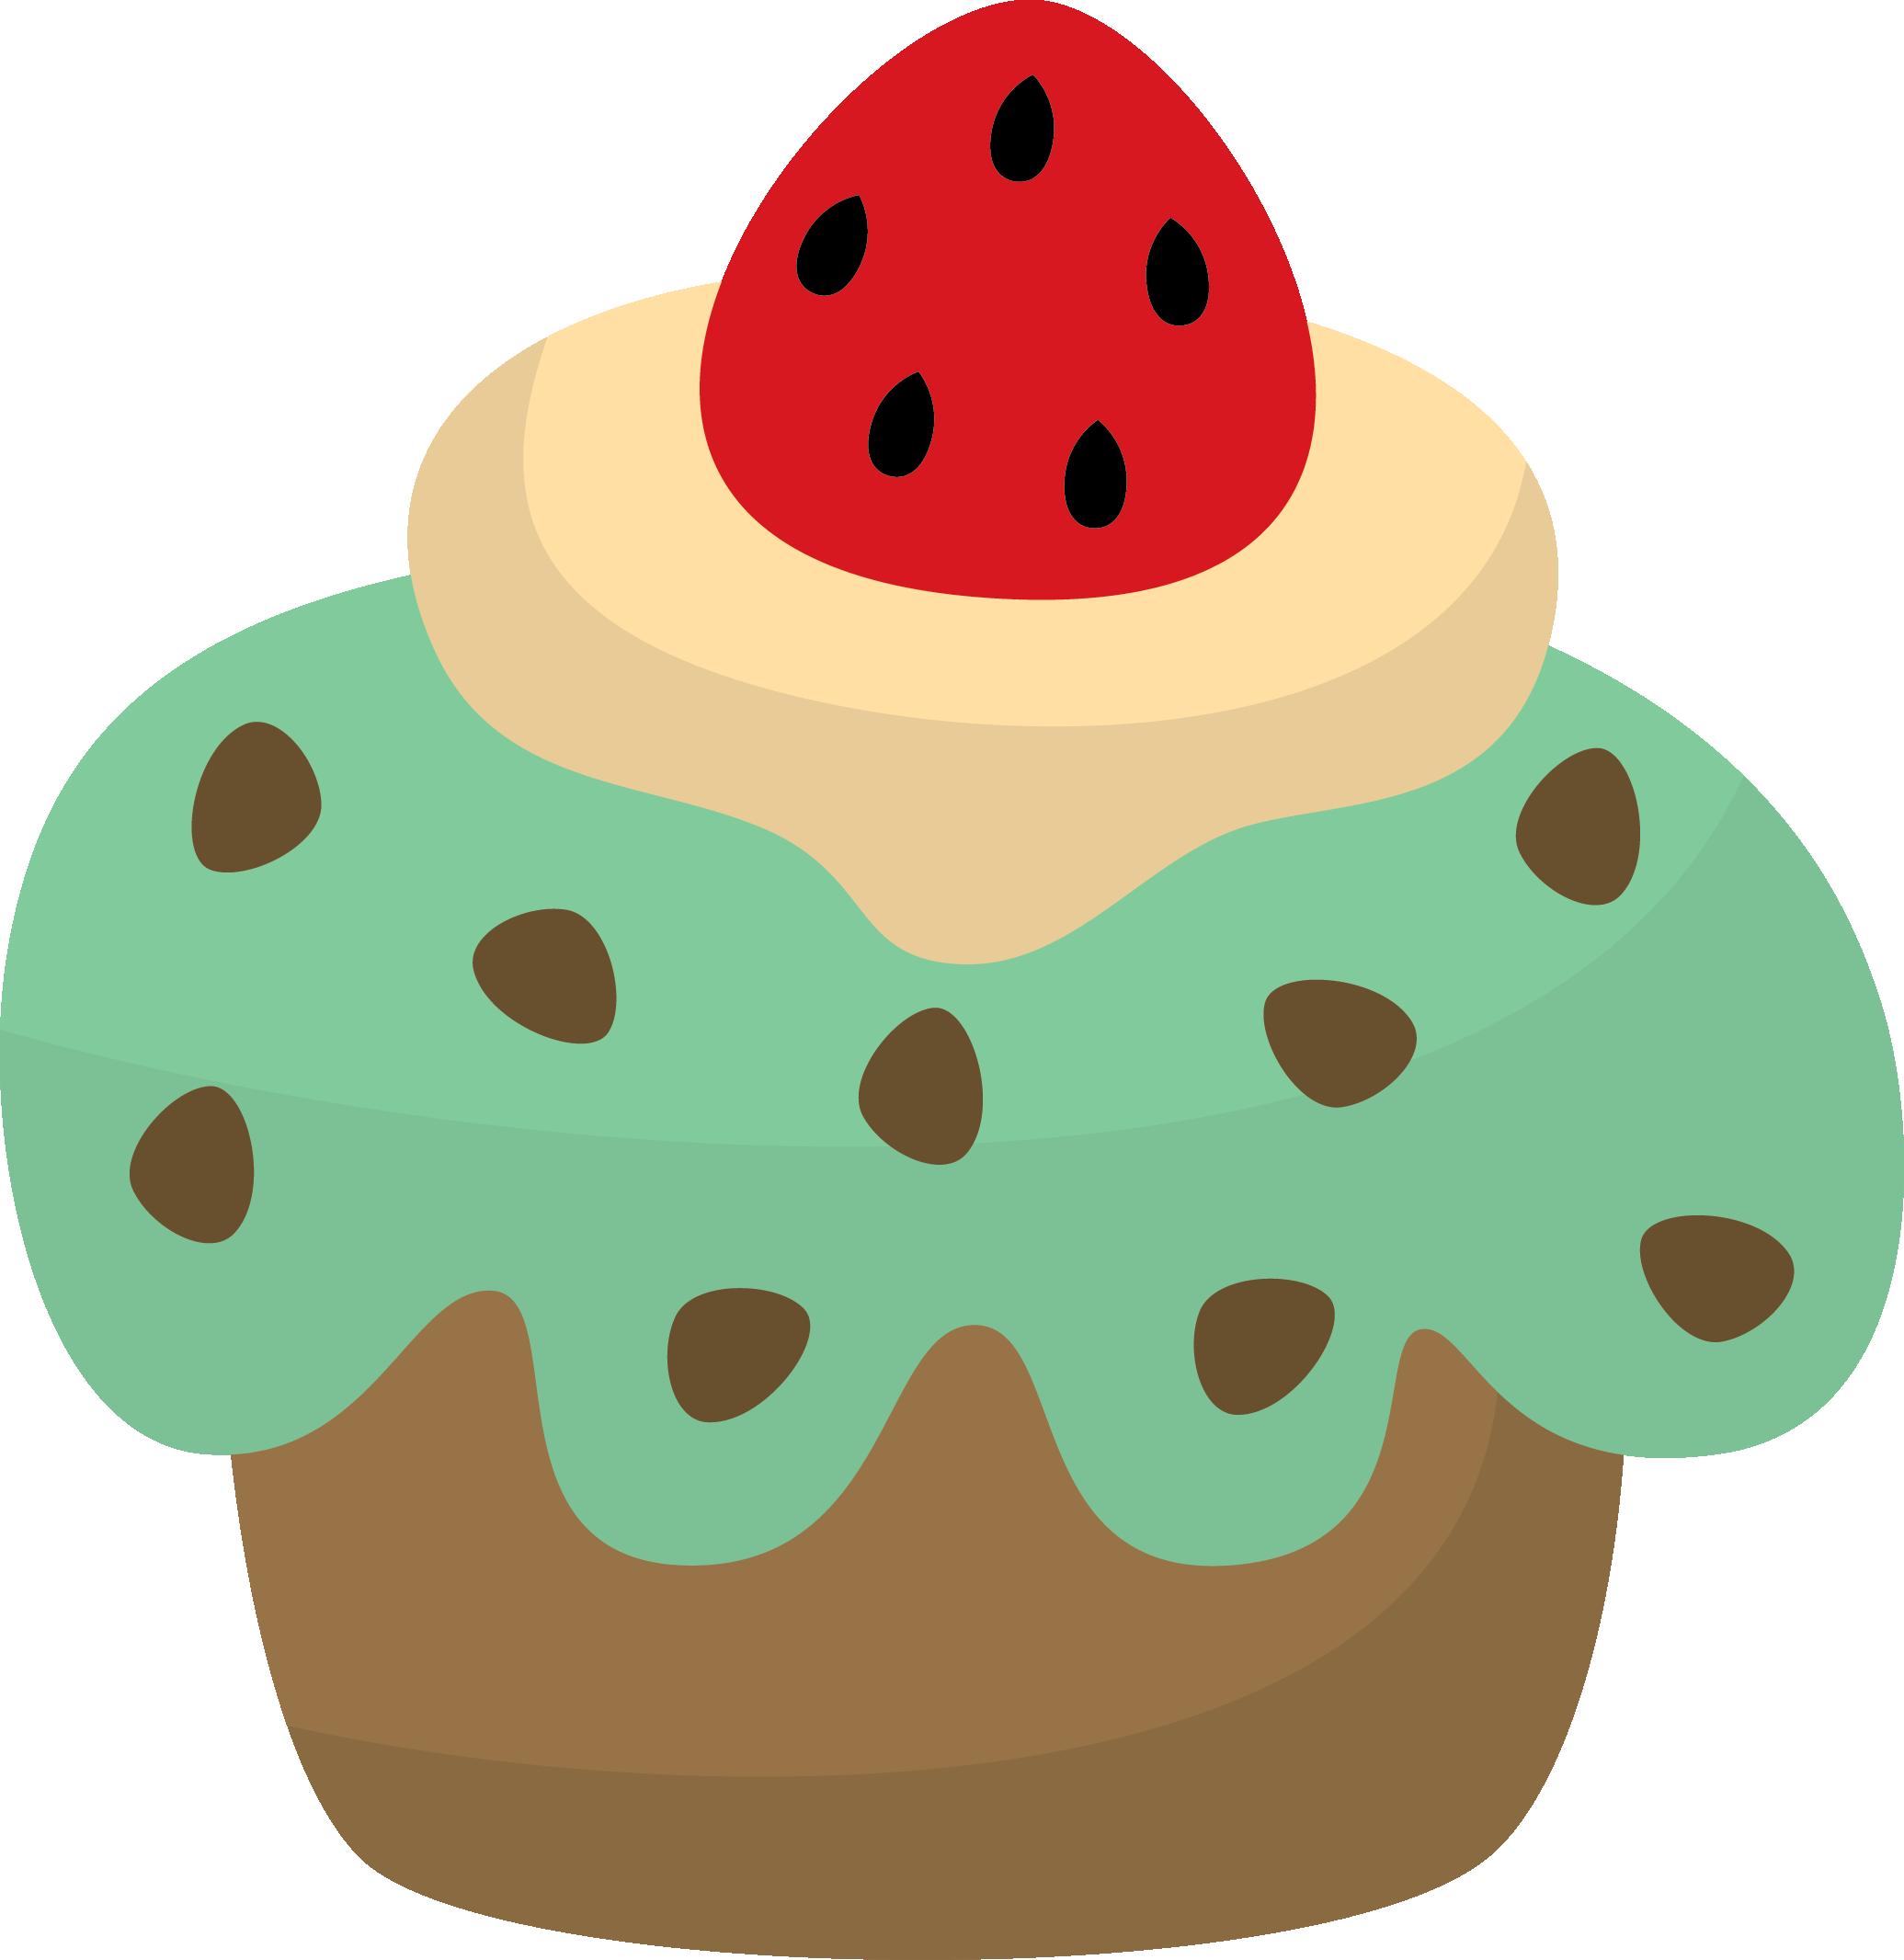 Cookie clipart cookie cake, Cookie cookie cake Transparent.